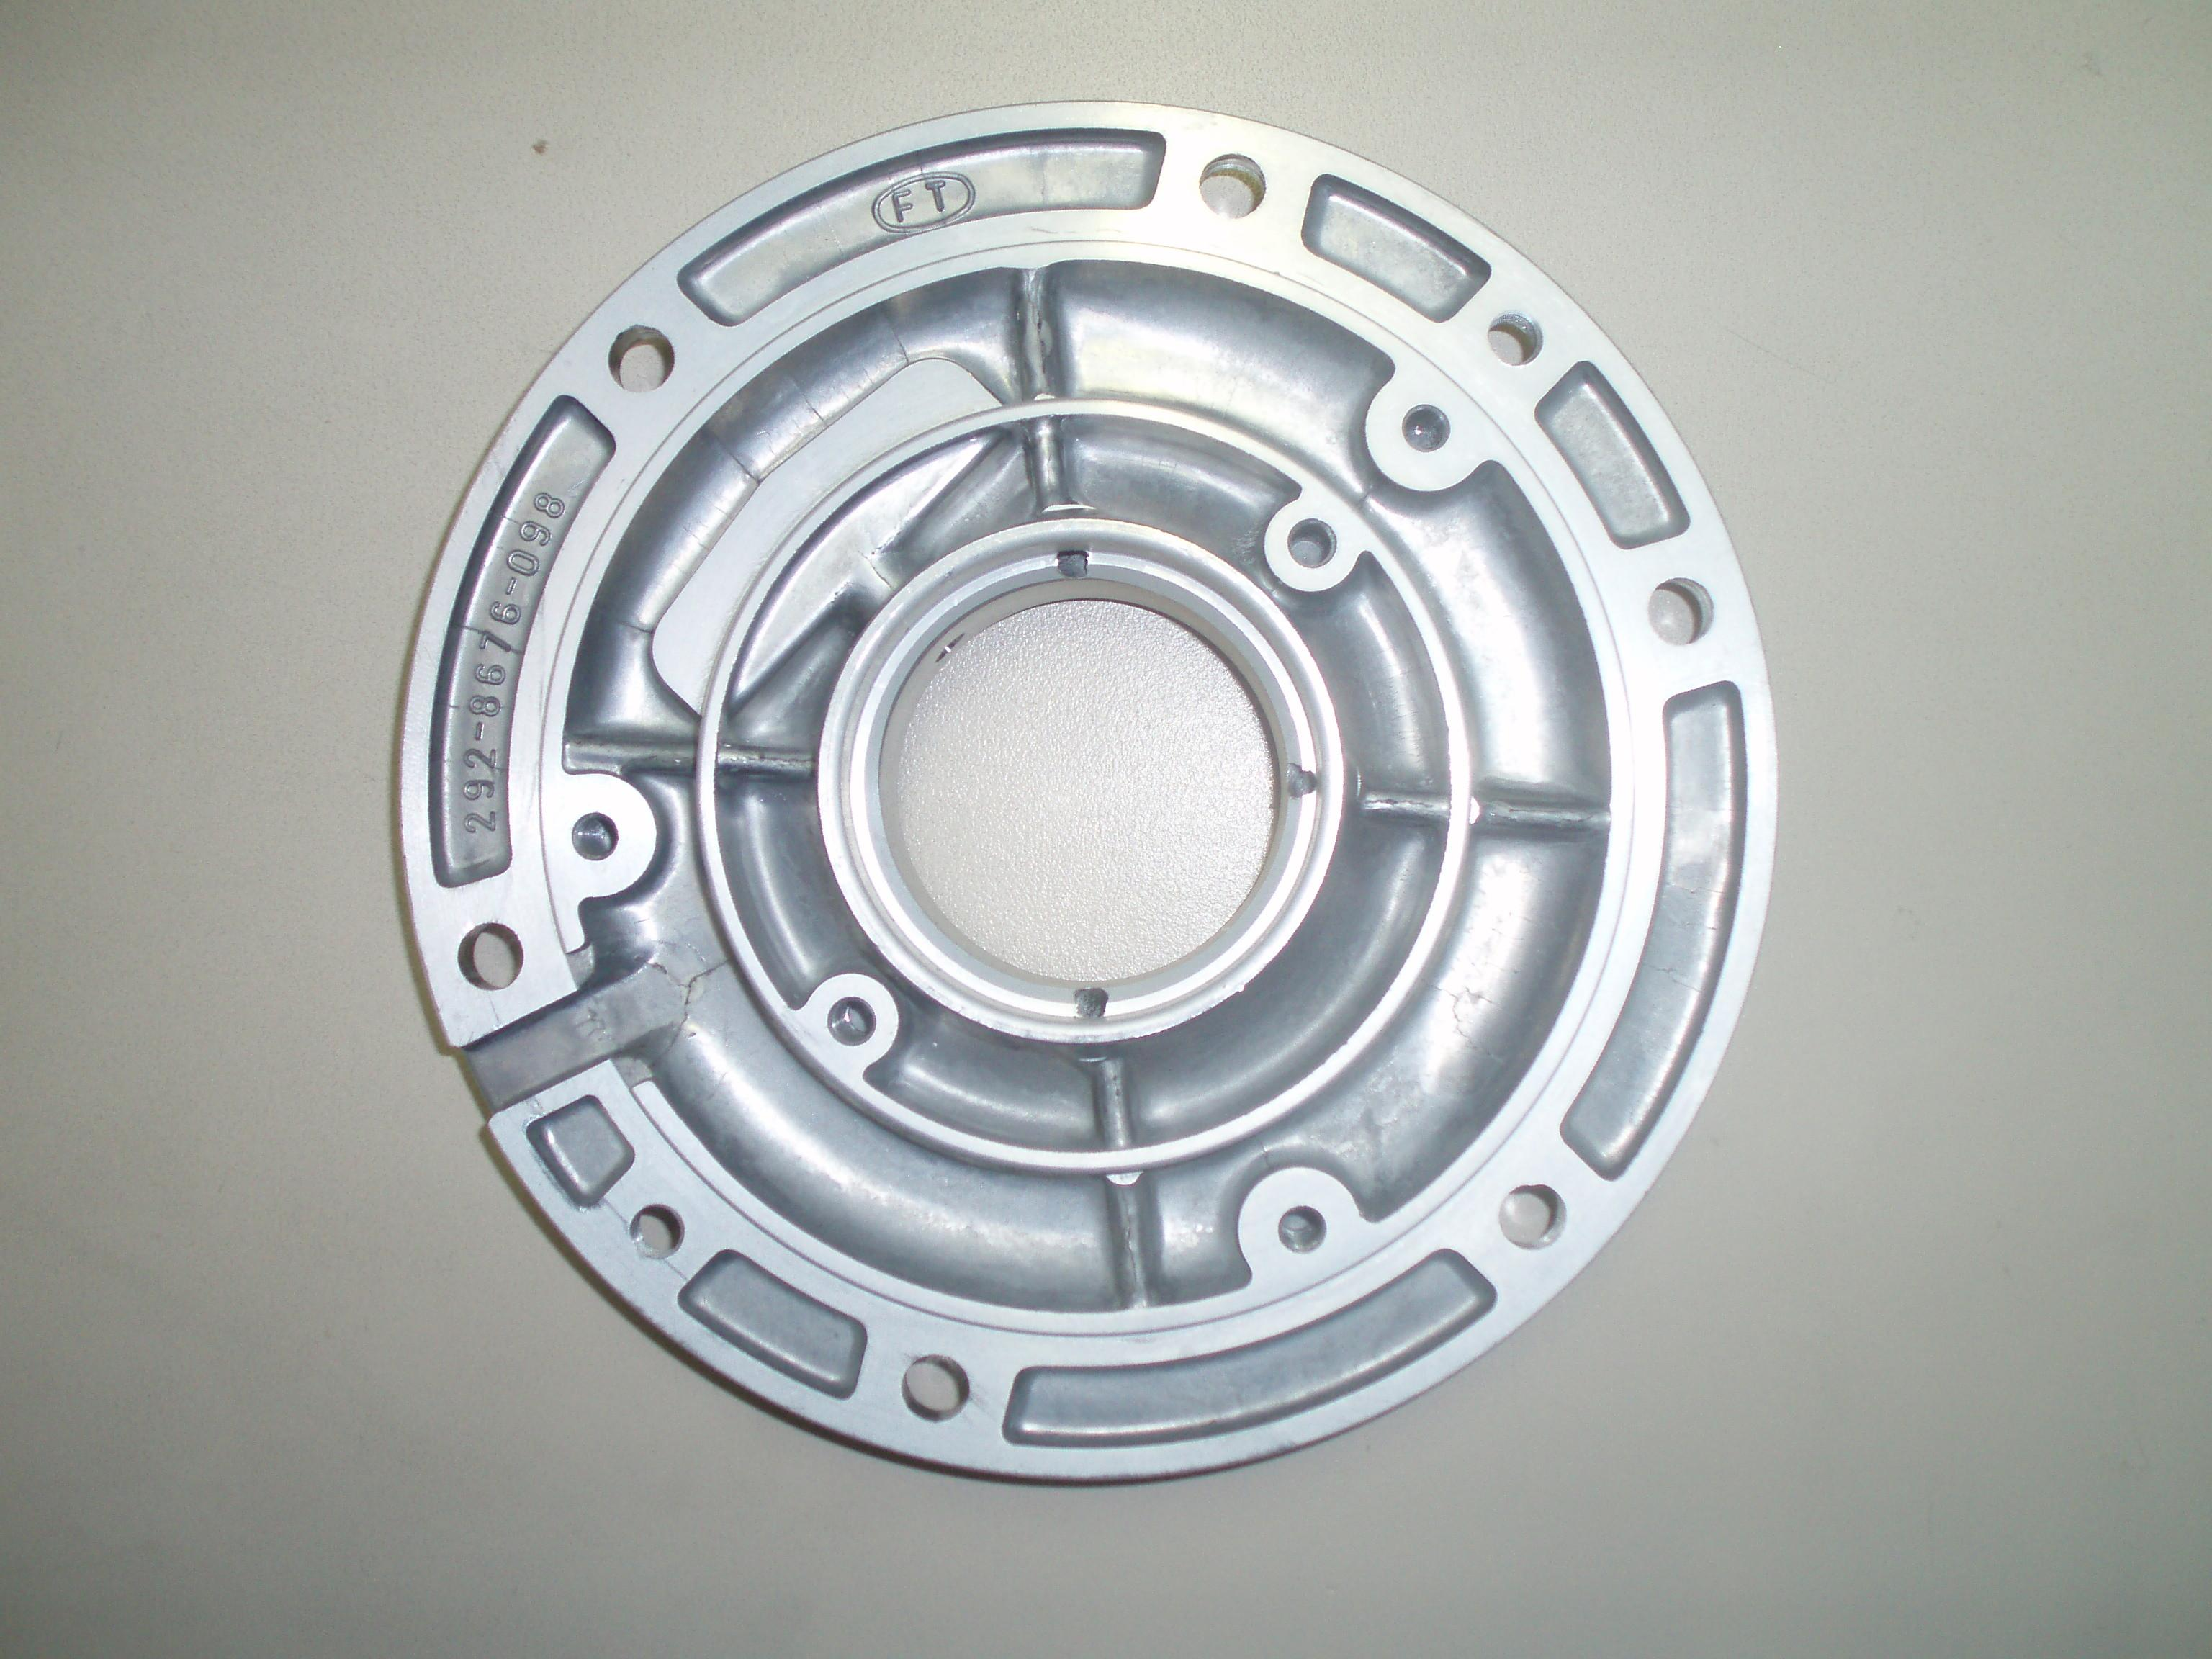 Support vilebrequin coté volant moteur 3LD450 3LD510 3LD511 LOMBARDINI 8676098 KOHLER ED0086760980-S